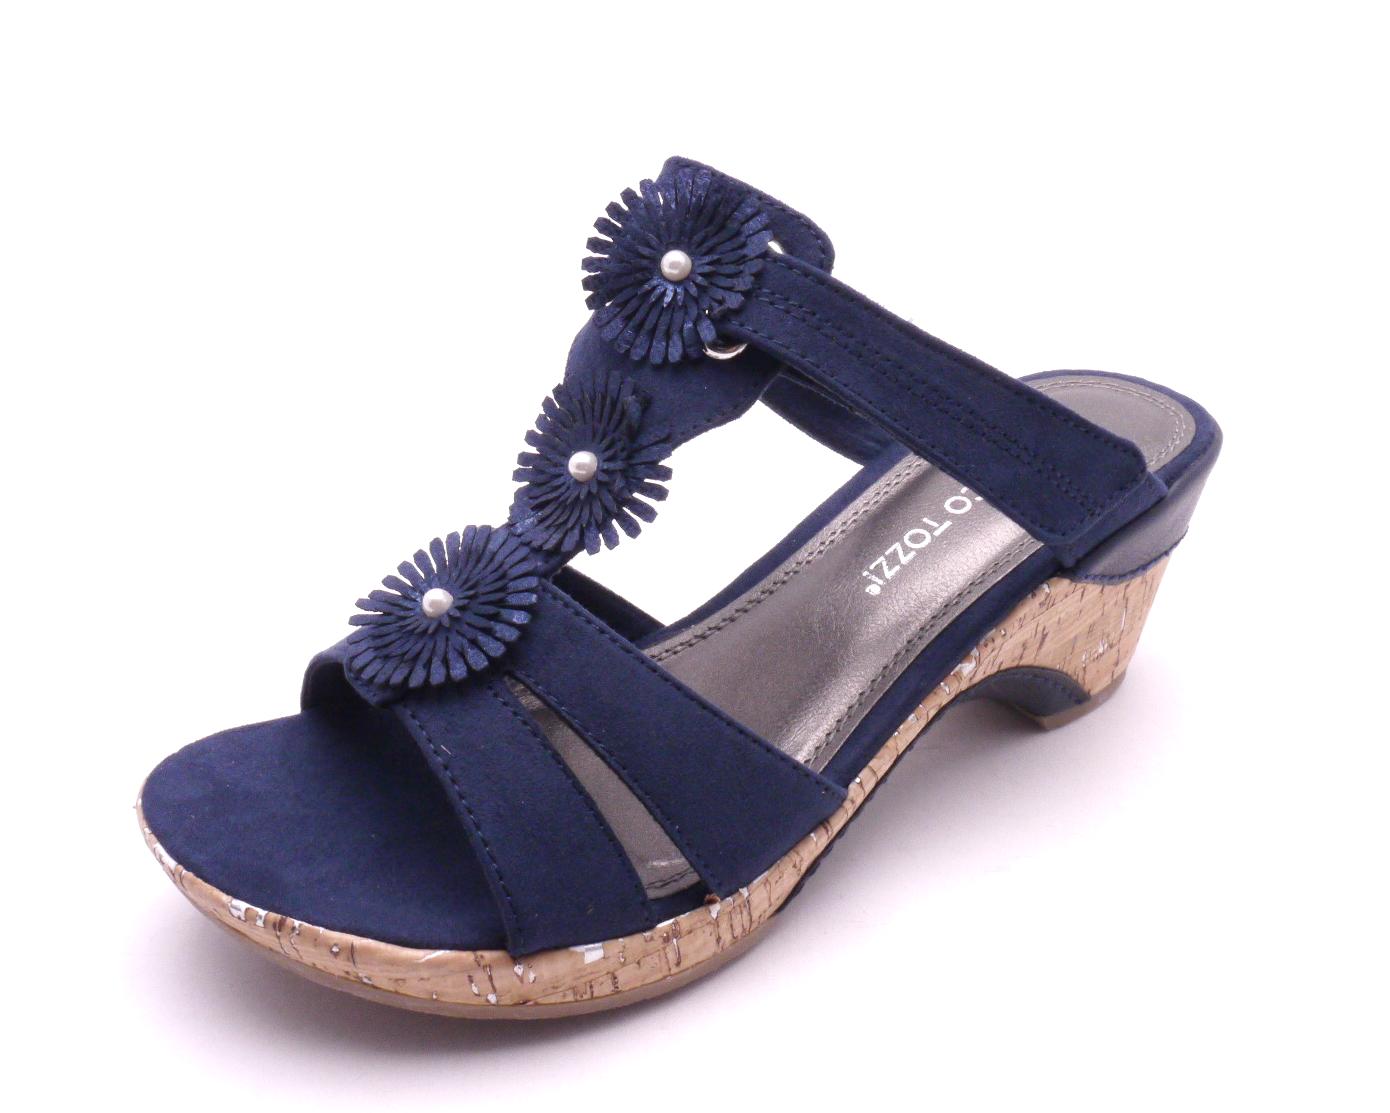 Marco Tozzi Dámské pantofle 2-27213-890 NAVY Velikost: 37